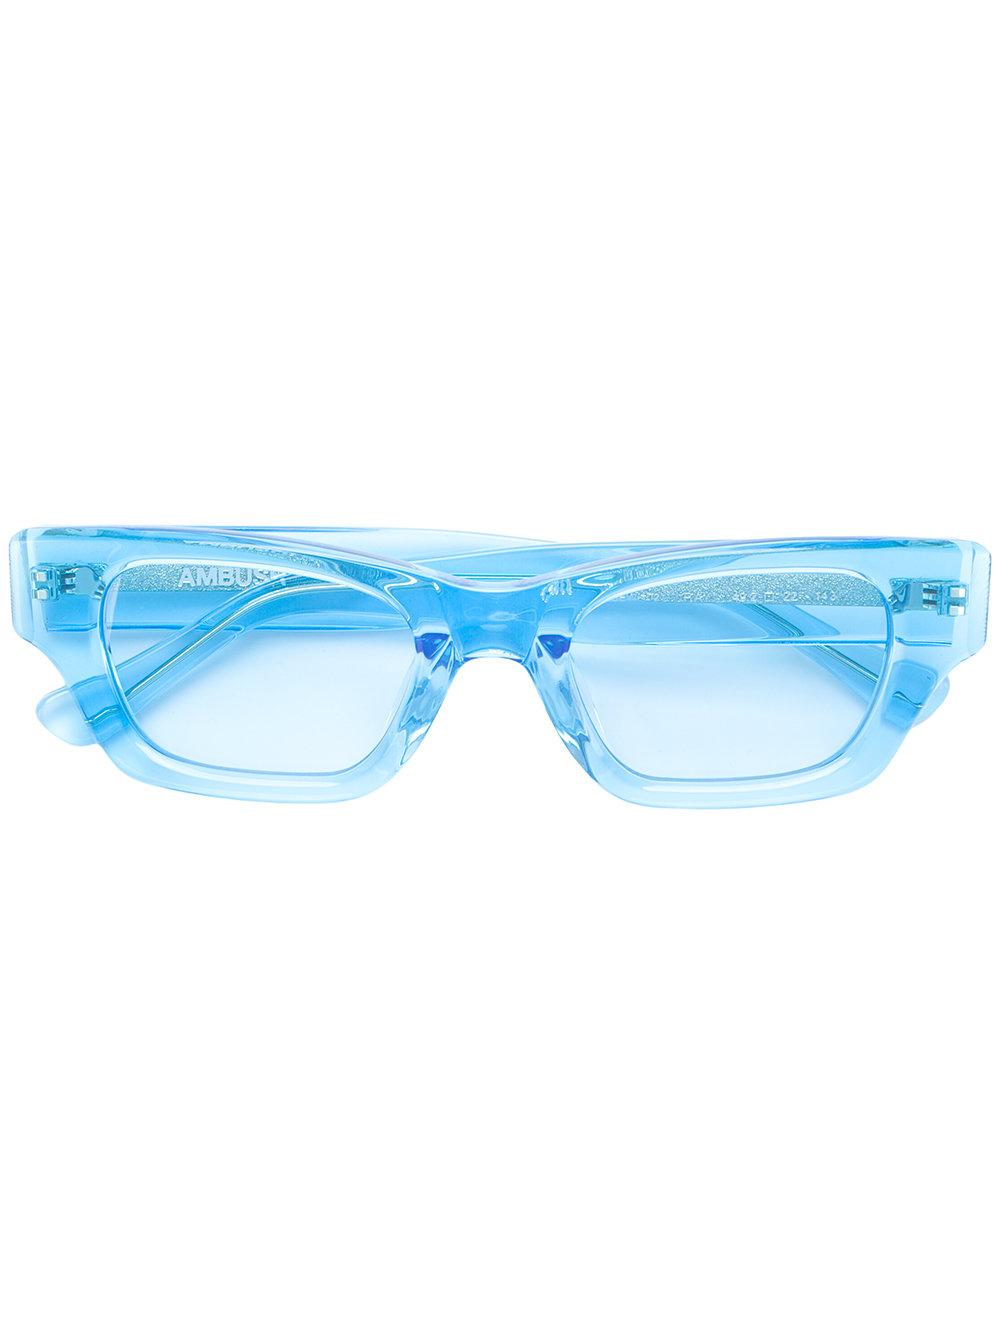 Ambush illesteva ivory baxter narrow sunglasses narrow rectangular sunglasses small sunglasses trend 90s sunglasses where to buy tiny sunglasses tiny 90s sunglasses narrow frame sunglasses tiny sunglasses trend